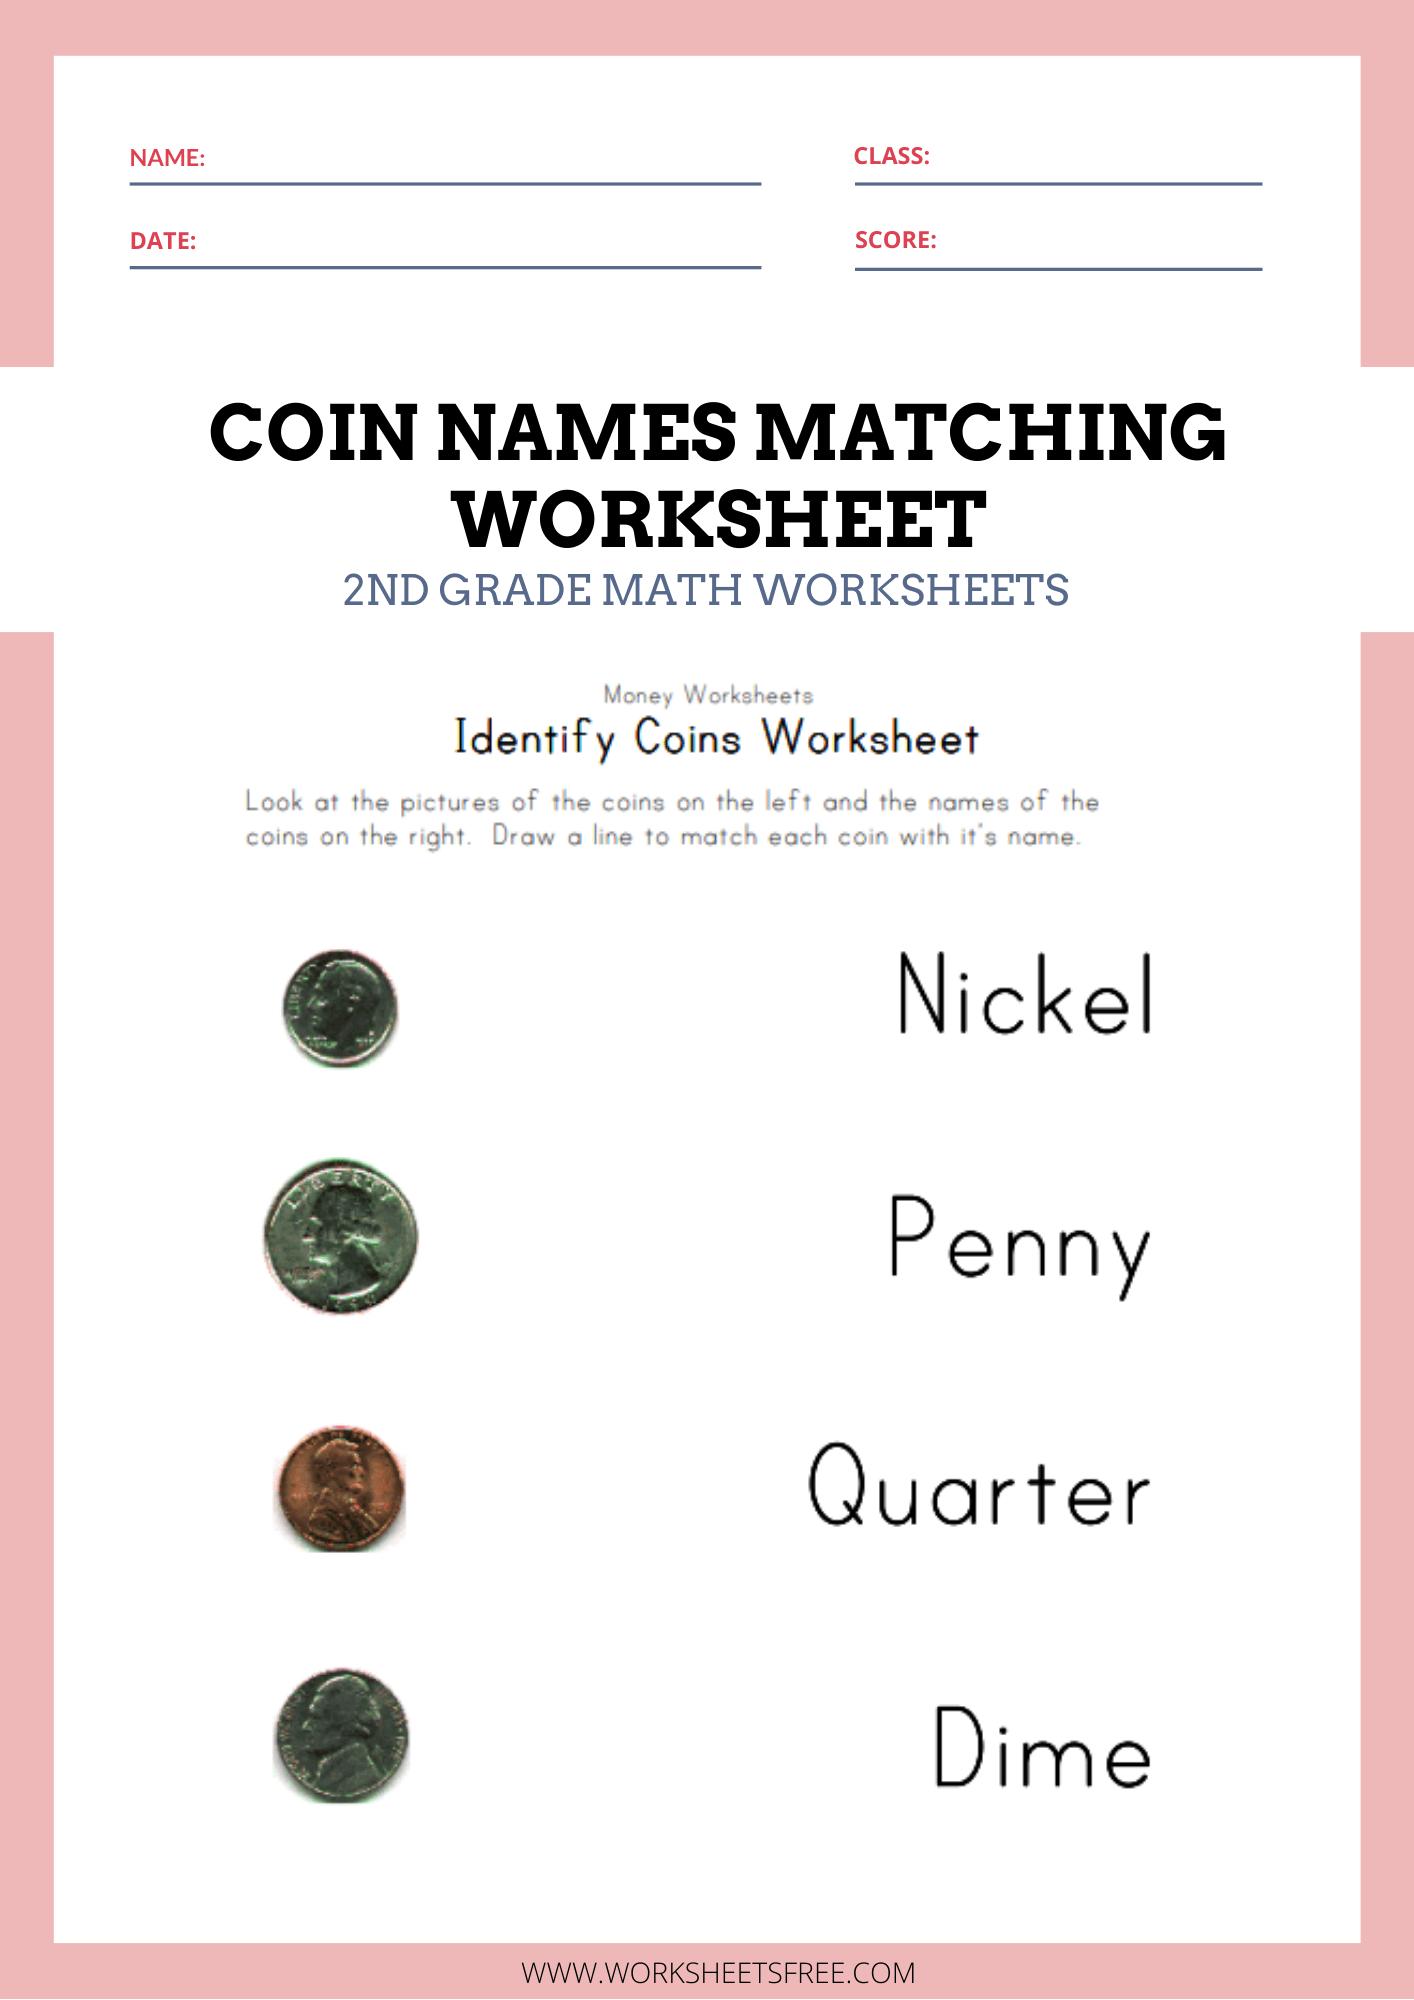 Coin-Names-Matching-Worksheet-Money-Worksheets-For-Kids   Worksheets Free [ 2000 x 1414 Pixel ]